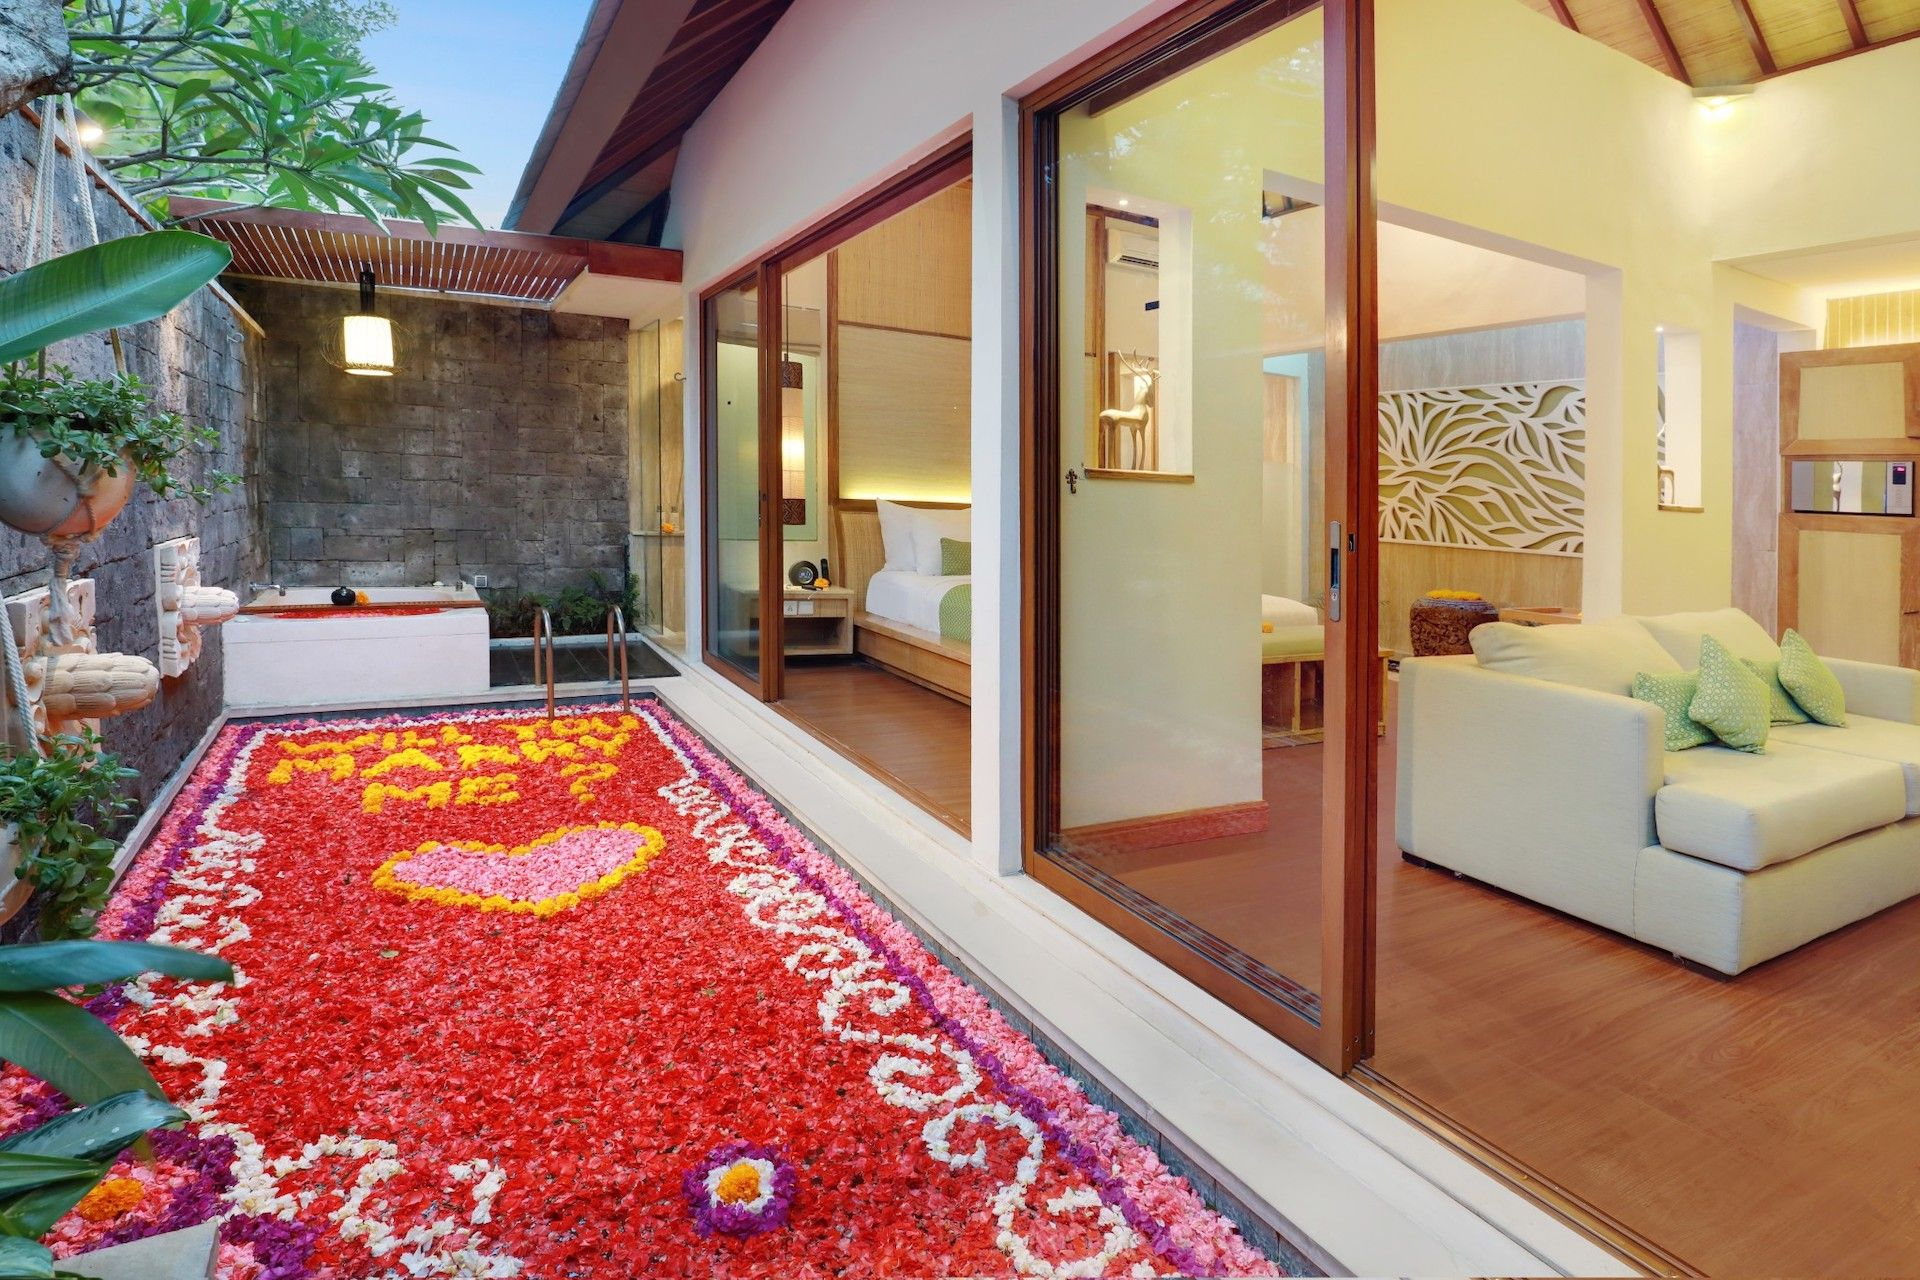 Luxury Romantic Villa Bali Honeymoon Villas Luxury Honeymoon Bali Luxury Villas